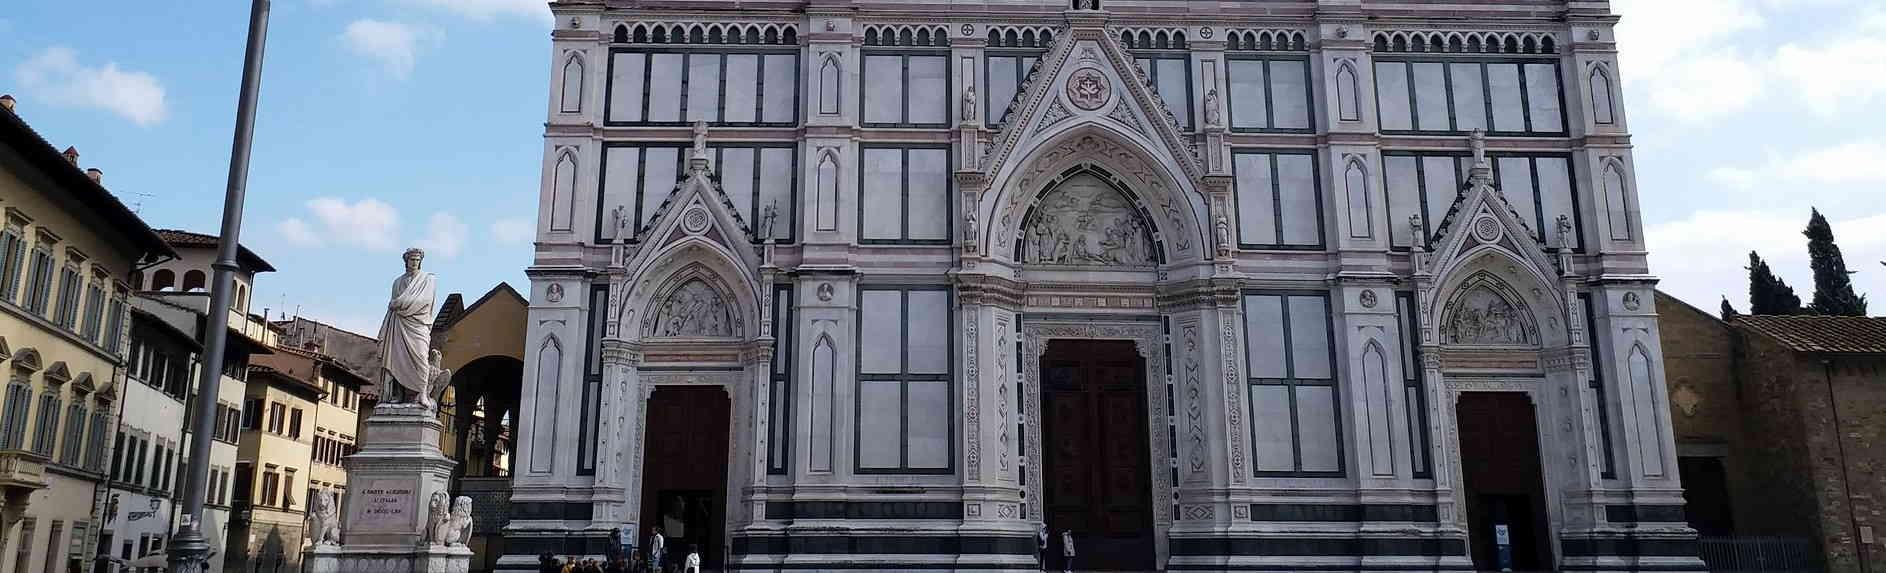 Basilica of Santa Croce